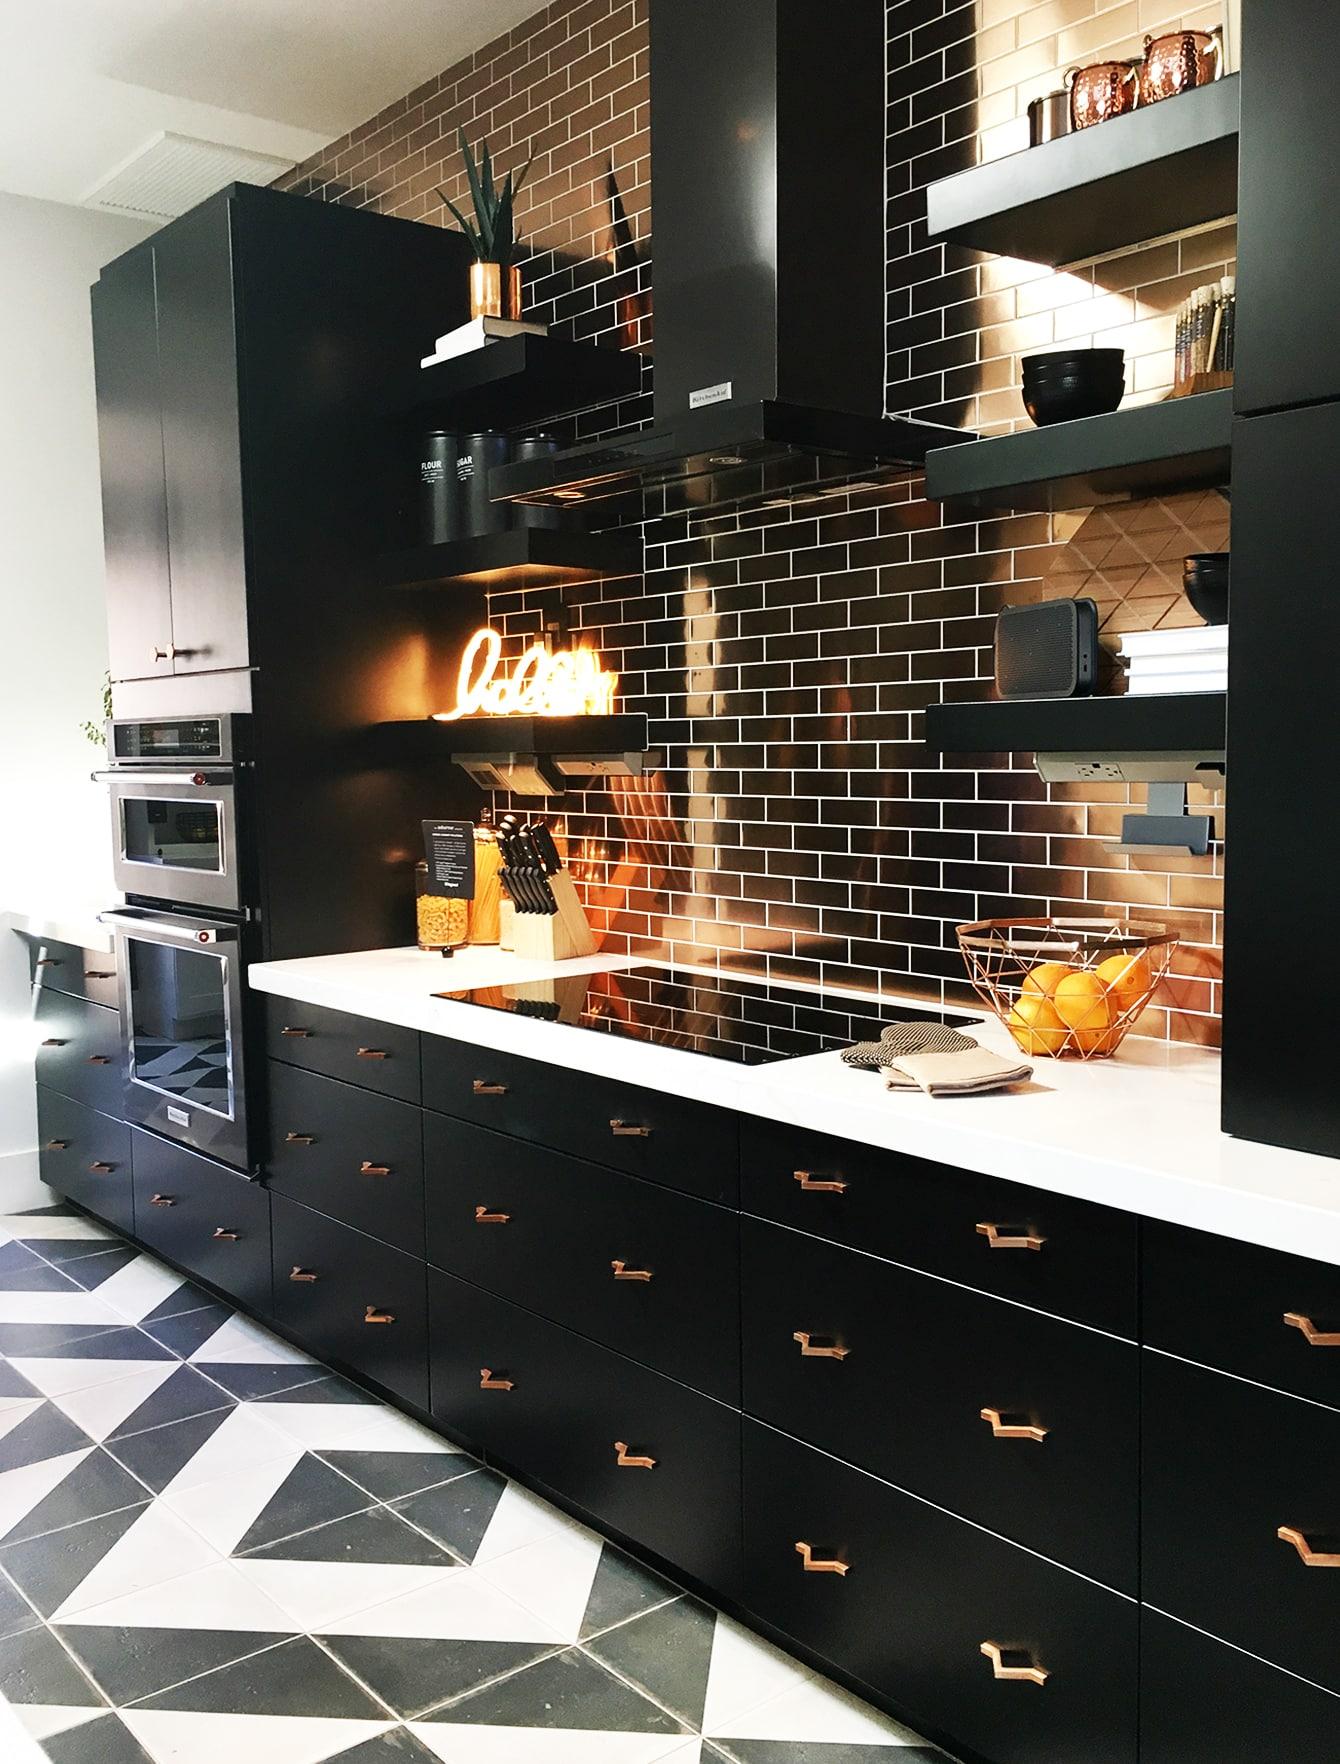 Design Details Of The Hgtv Smart Home 2016 Kitchen: HGTV Smart Home Tour